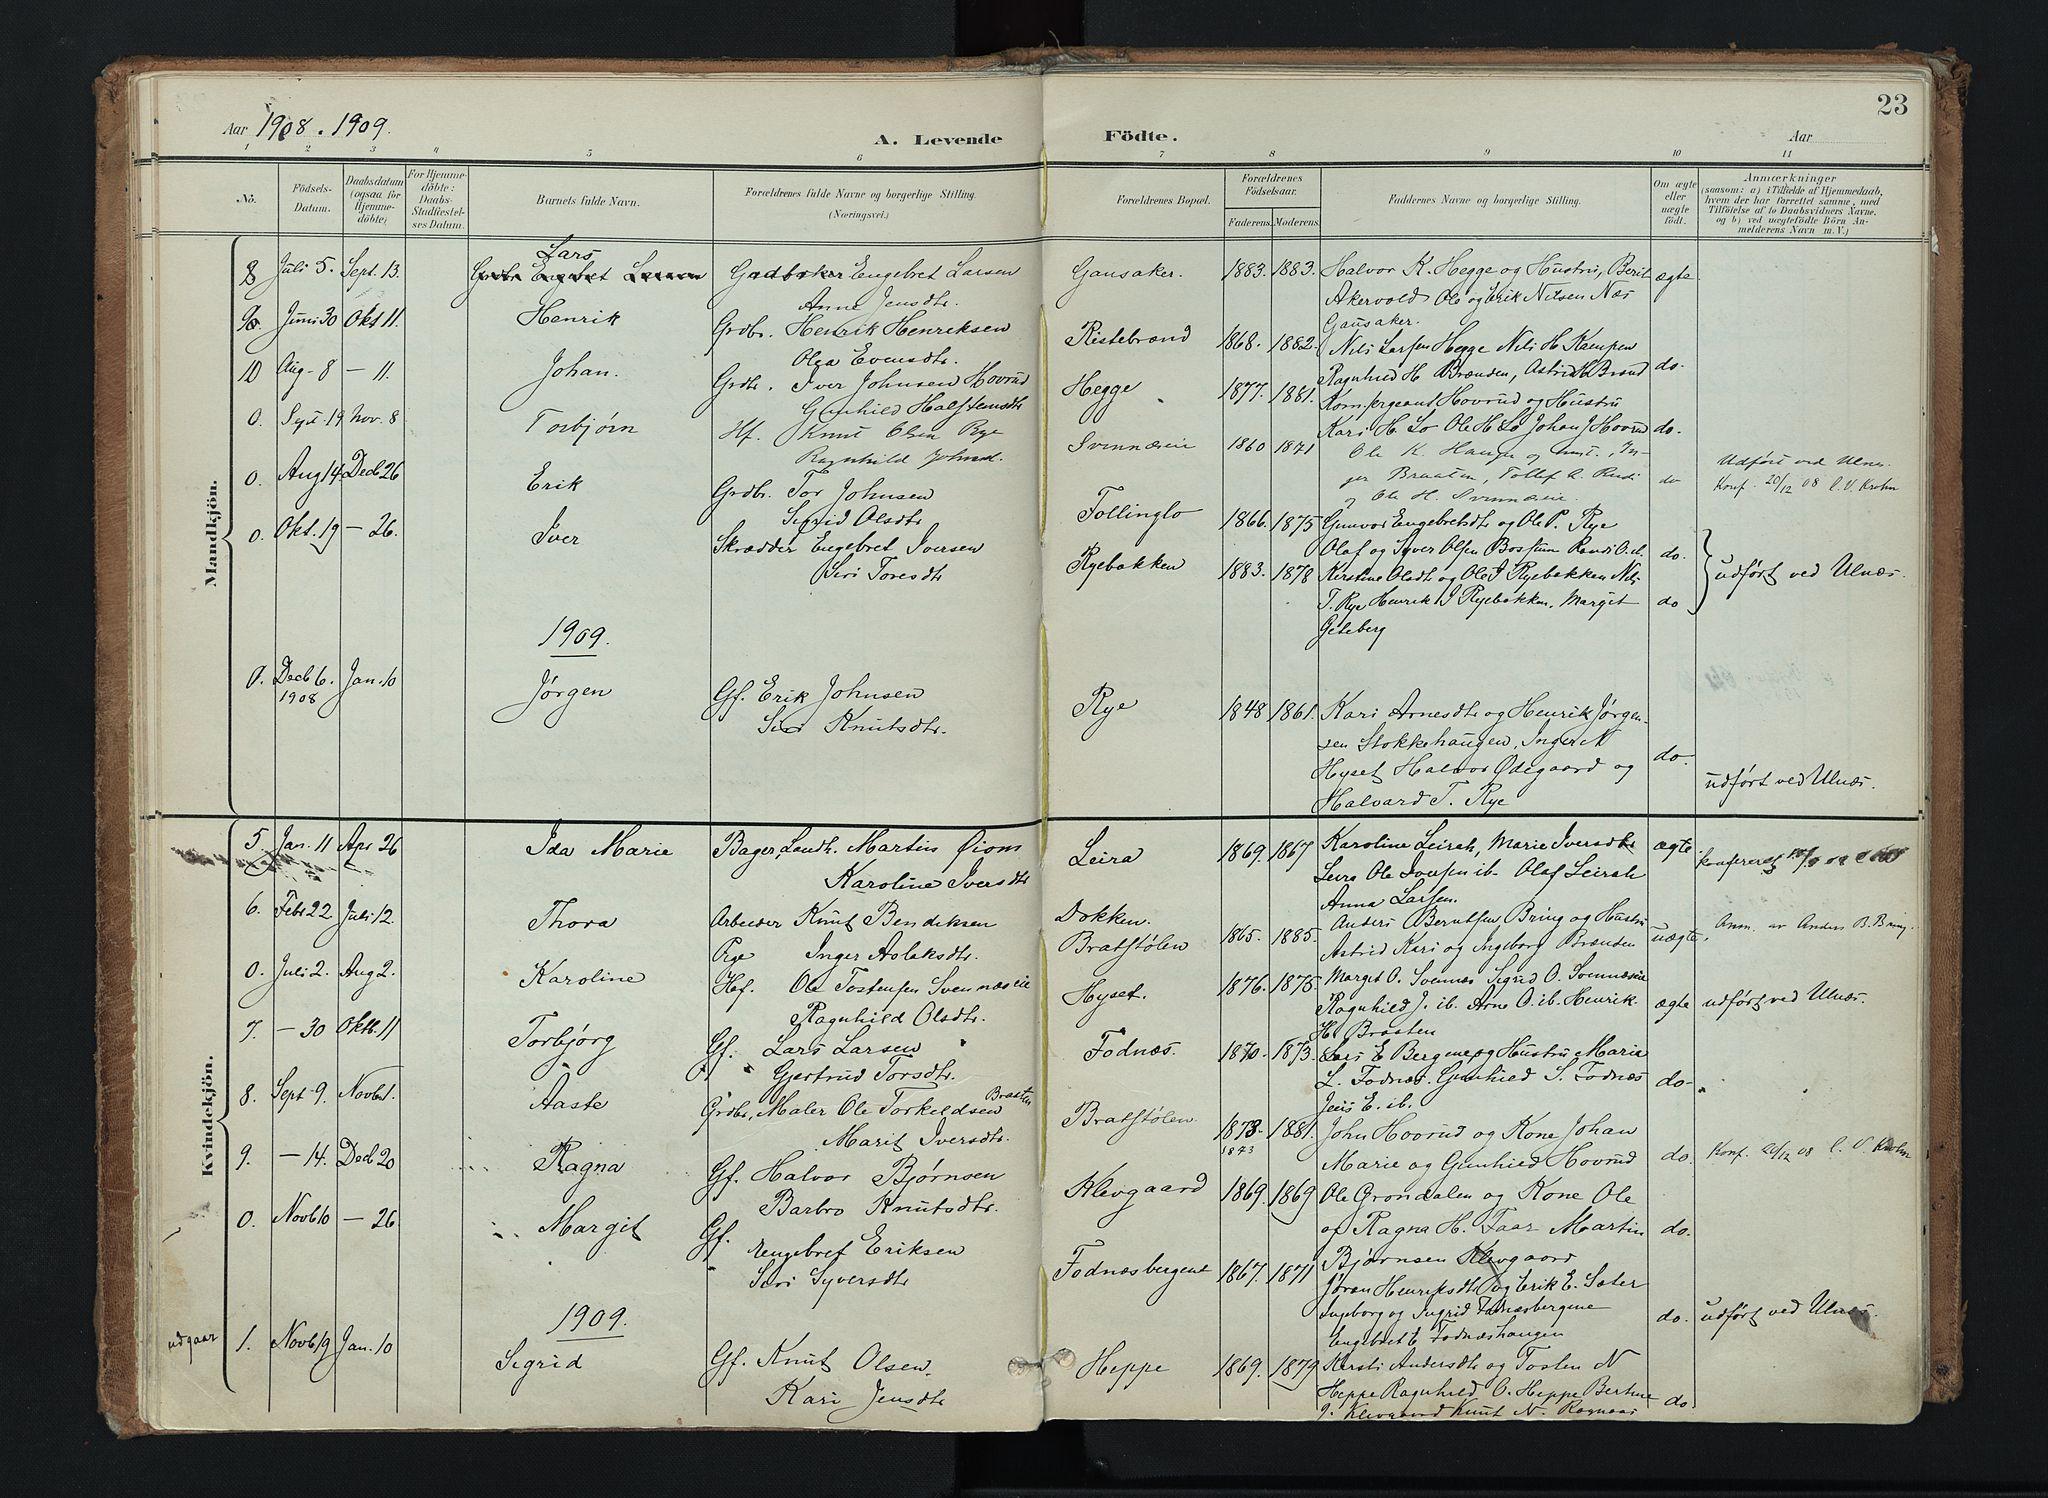 SAH, Nord-Aurdal prestekontor, Ministerialbok nr. 16, 1897-1925, s. 23